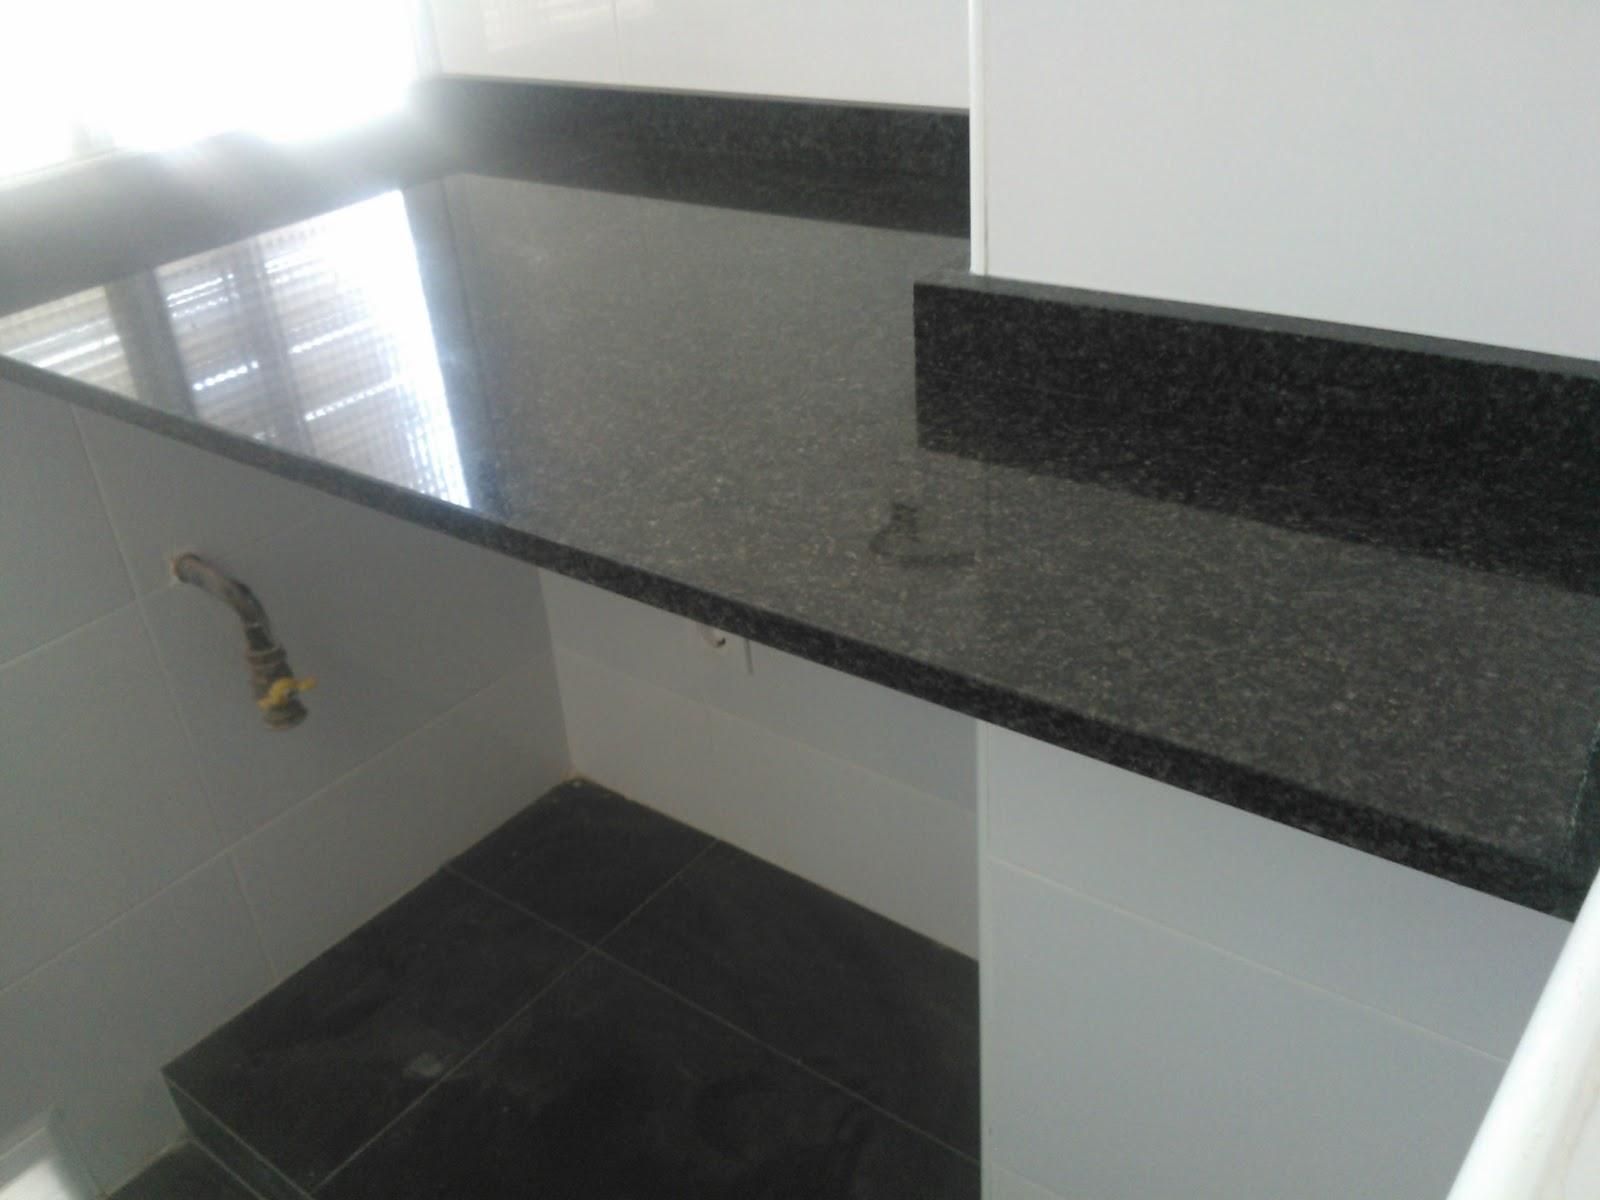 Marmoles vedat s l u montaje encimera granito negro for Granito importado colores